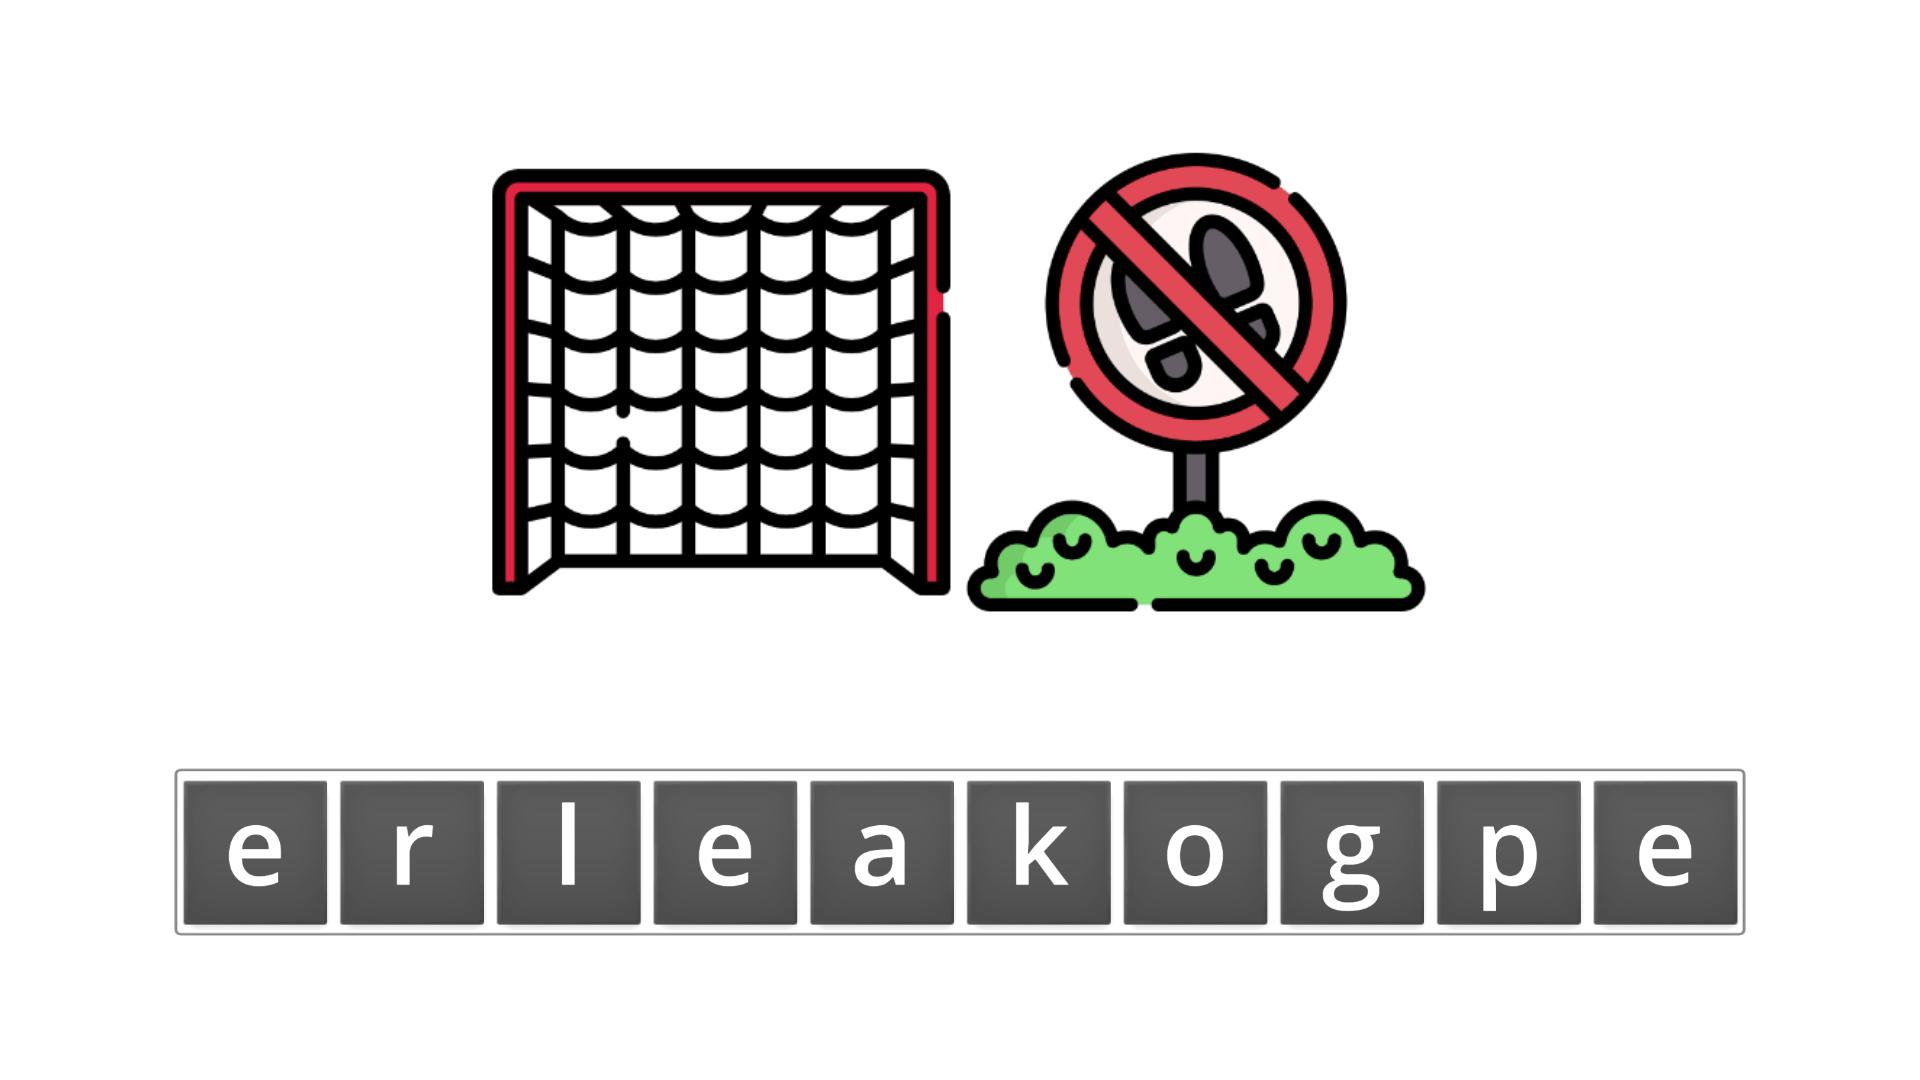 esl resources - flashcards - compound nouns - unscramble - goalkeeper